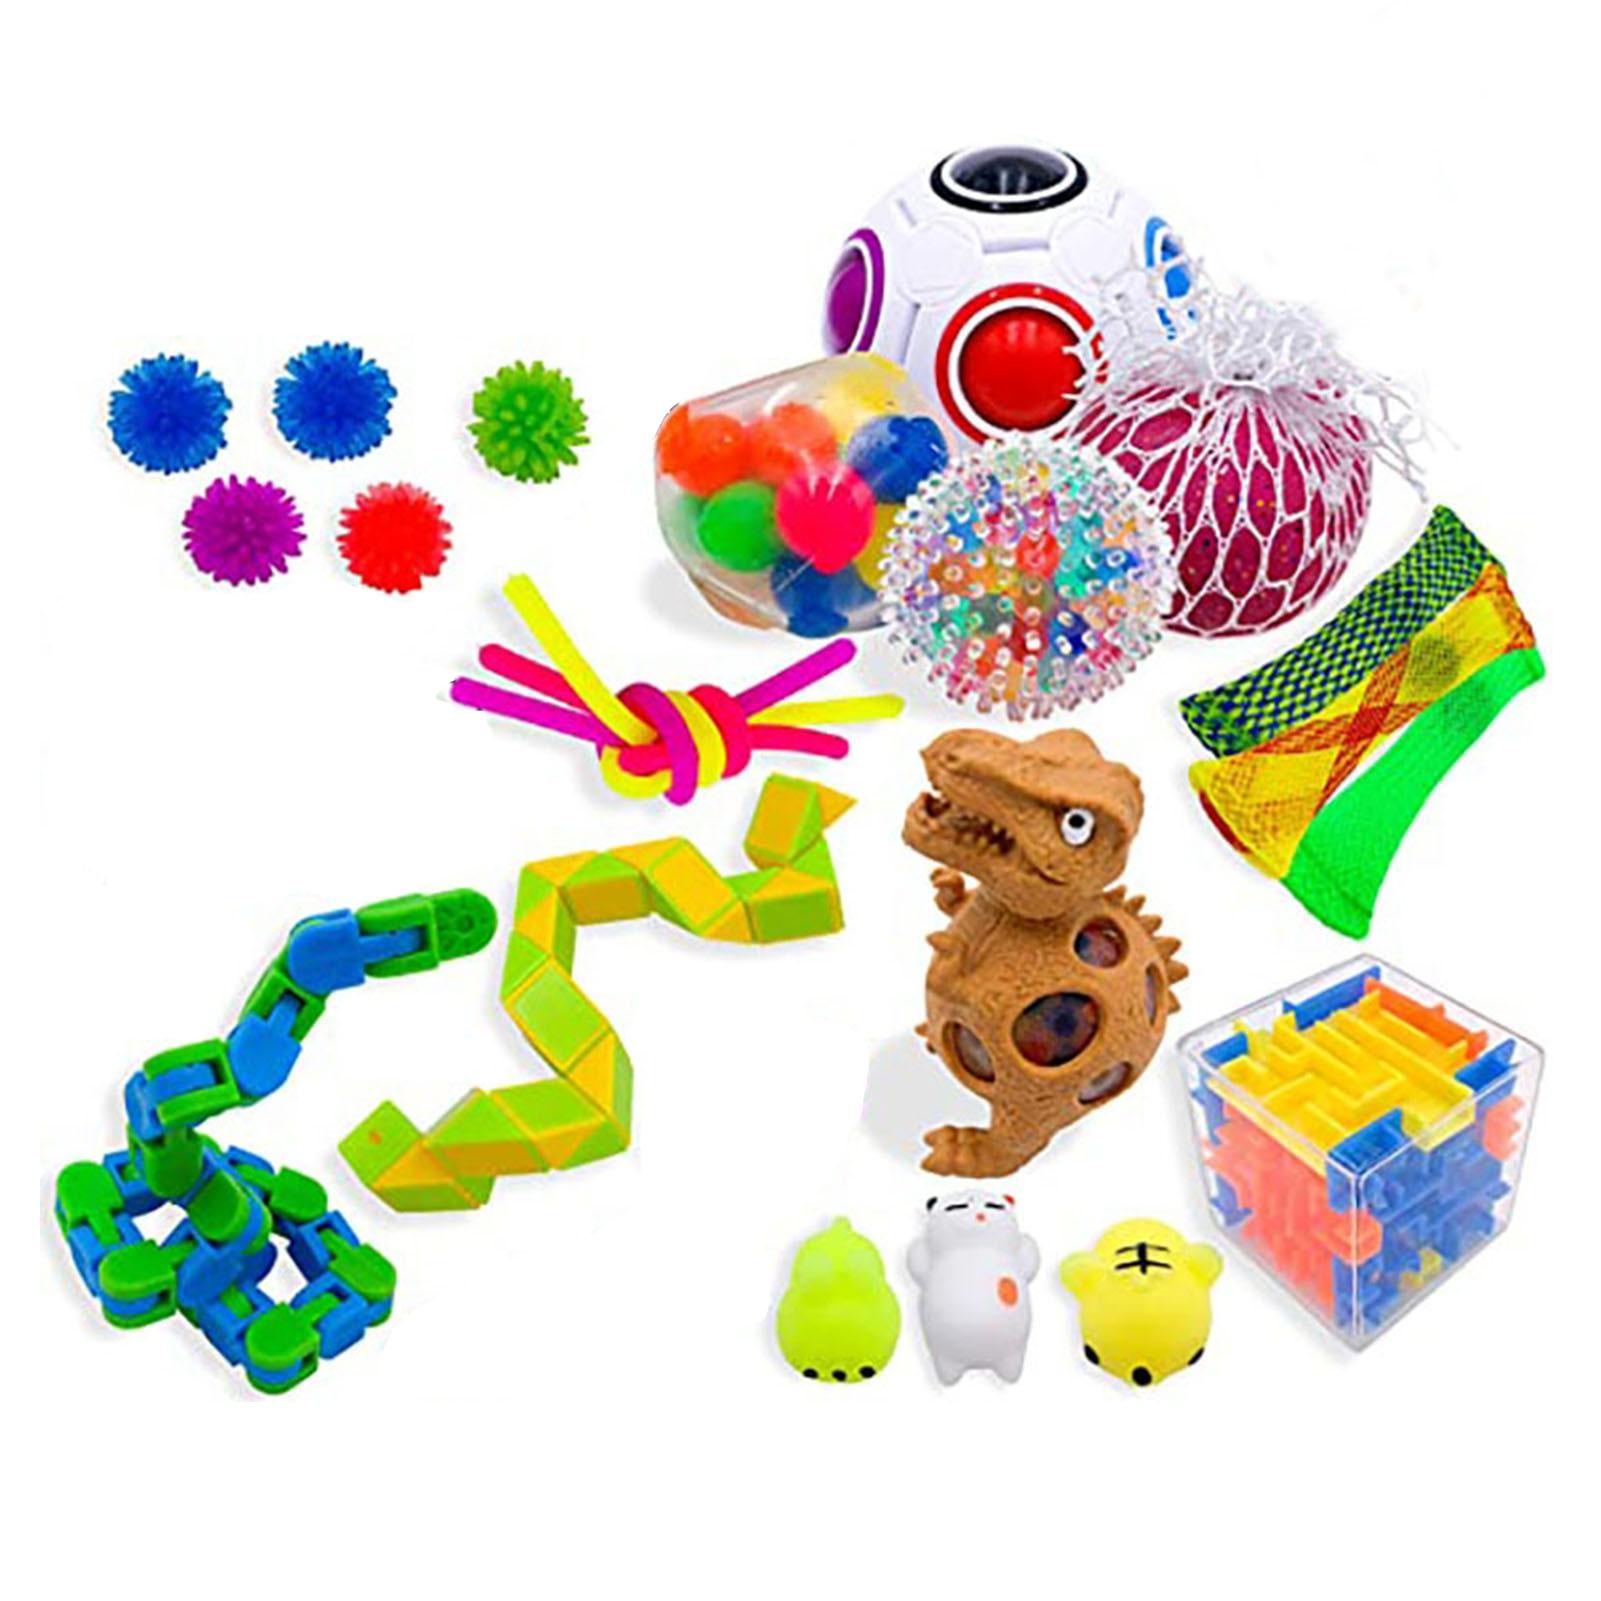 Fidget Sensory Toy Anti Stress Toy Set Pop Bubble Stretchy Strings Mesh Marble Fidget Simple Dimple Toys For Kids Adults